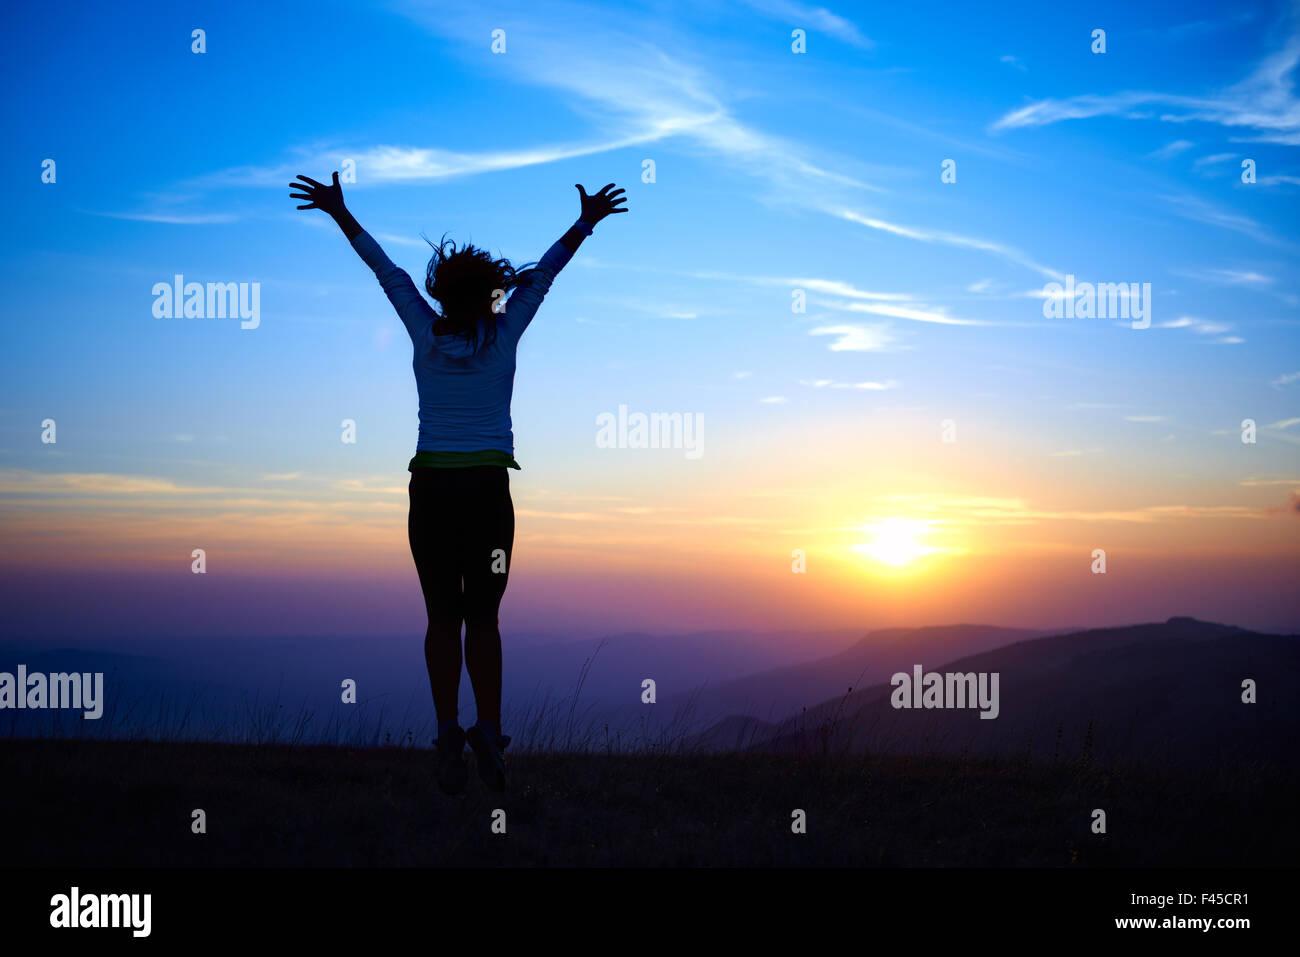 Silueta de saltar joven Imagen De Stock